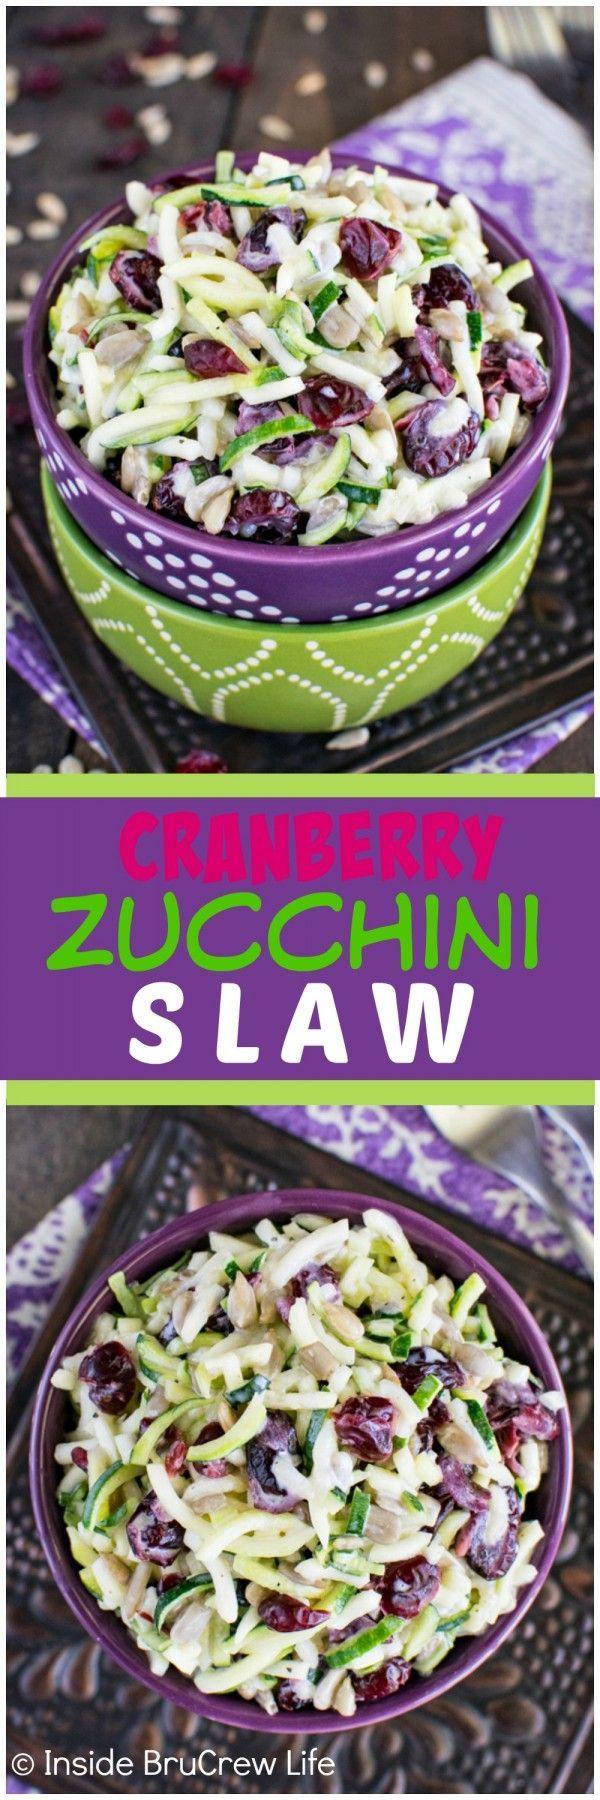 Blue apron zucchini slaw - Cranberry Zucchini Slaw